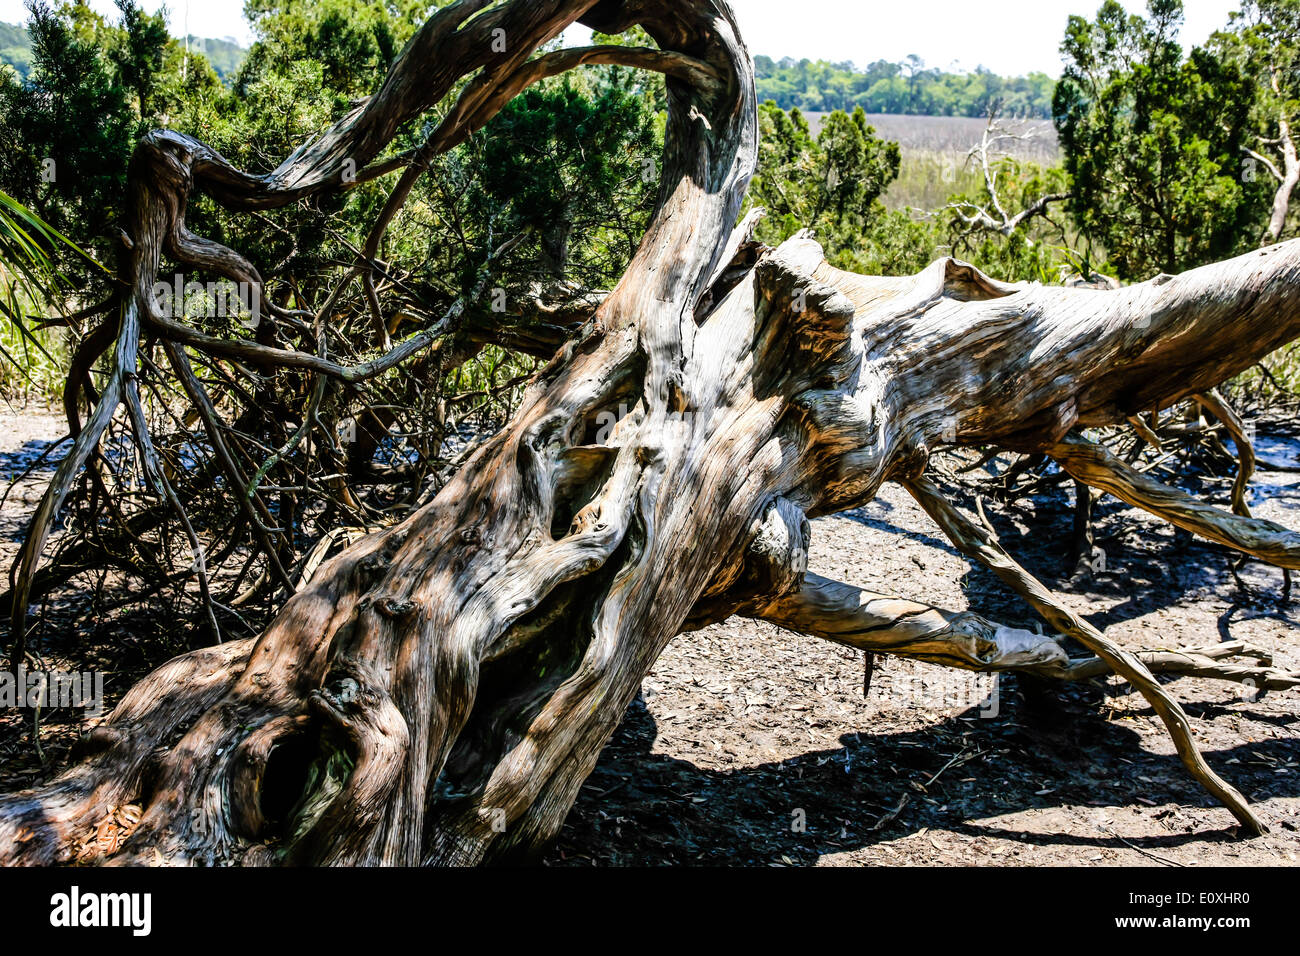 Dead dried out tree on the edge of the Salt Marsh nr Savannah GA - Stock Image